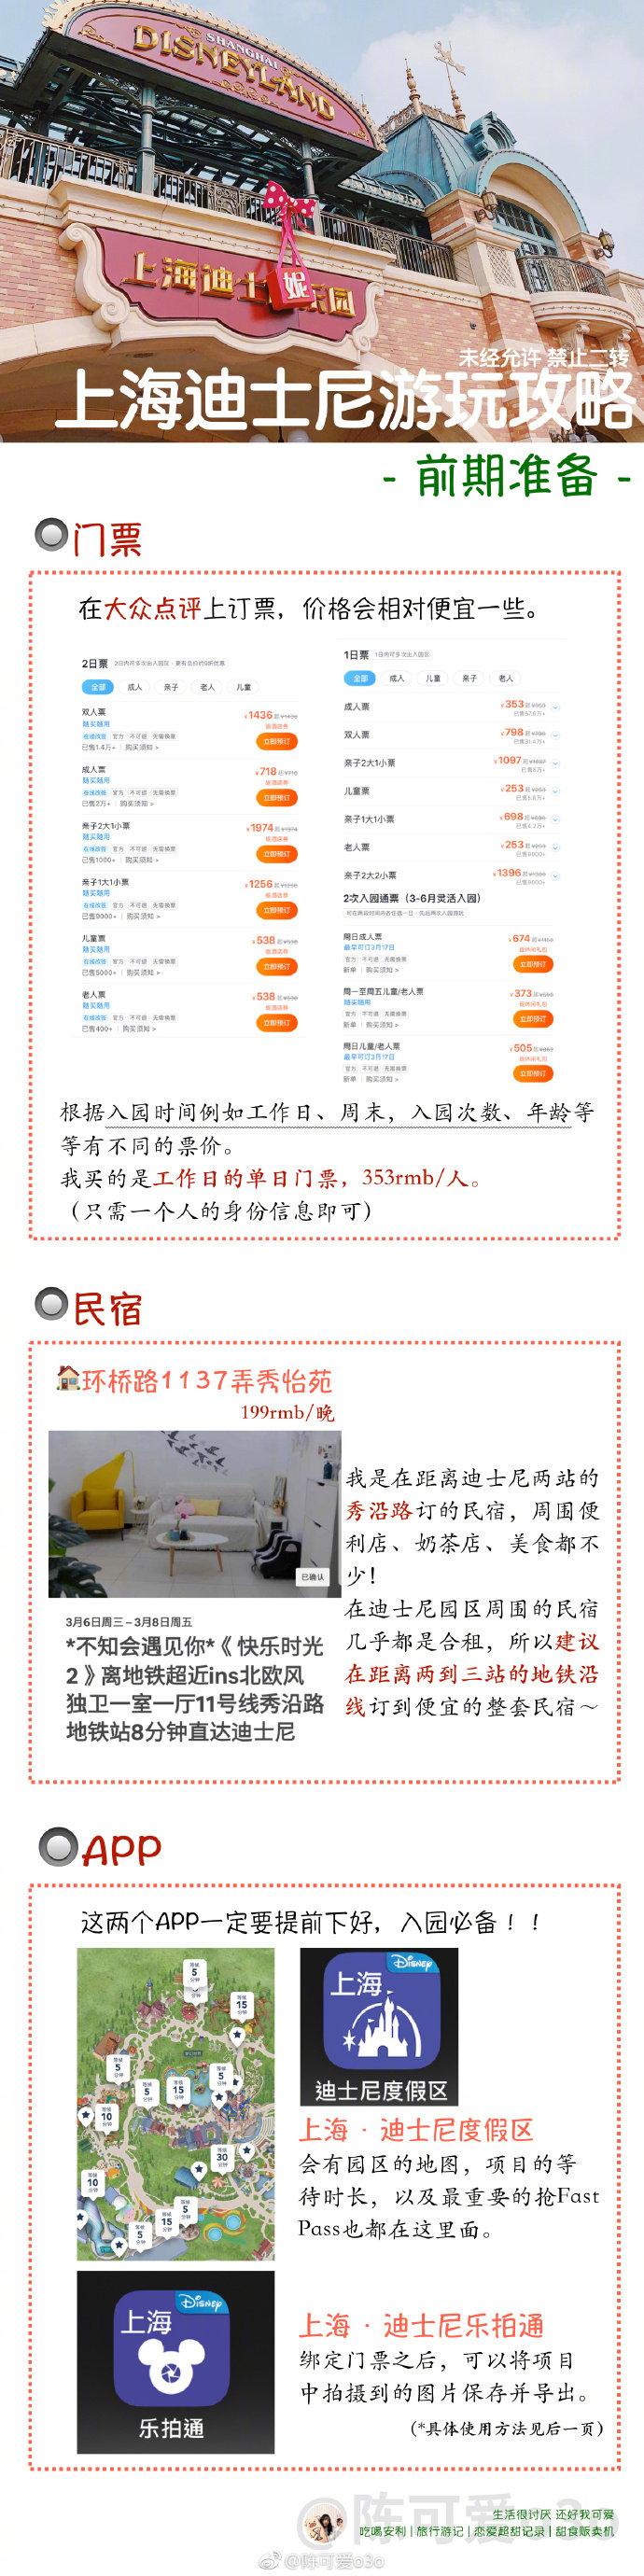 "◎OneDay | 上海迪士尼入门级游玩""每个人心目中都有一座城堡永远"